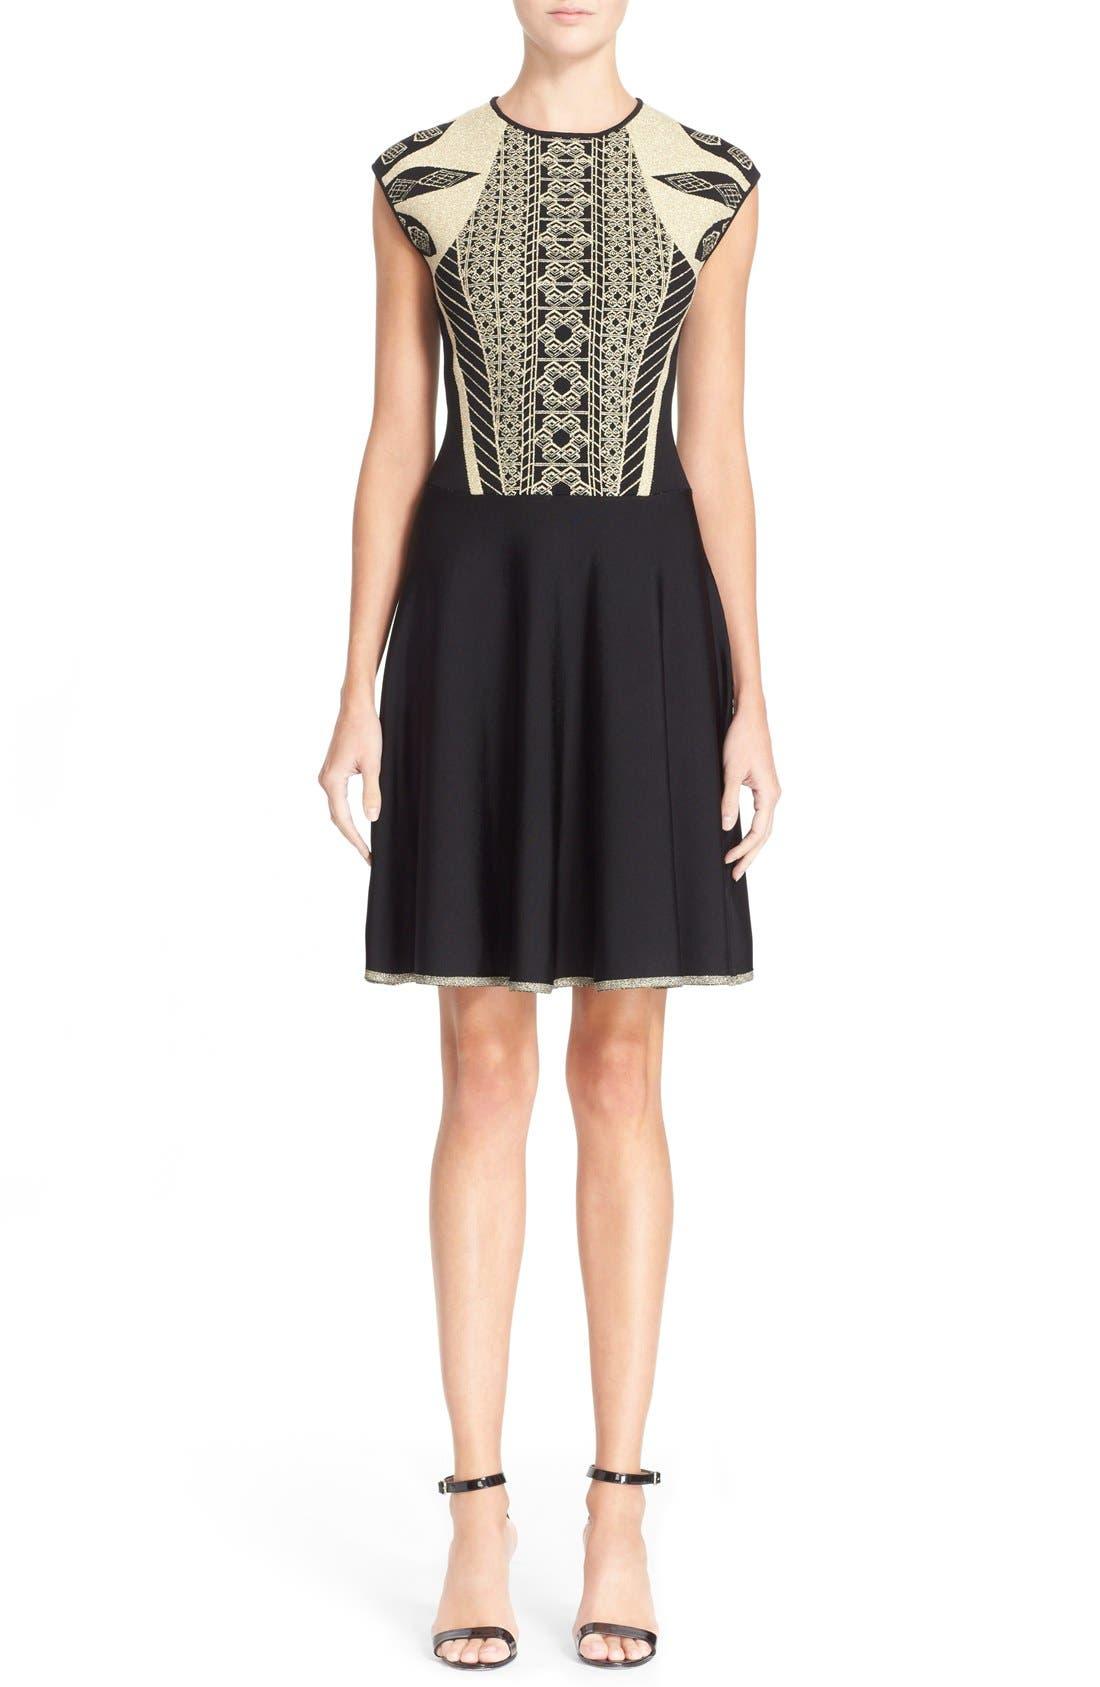 Alternate Image 1 Selected - Ted Baker London 'Jenkin' Metallic Jacquard Fit & Flare Dress